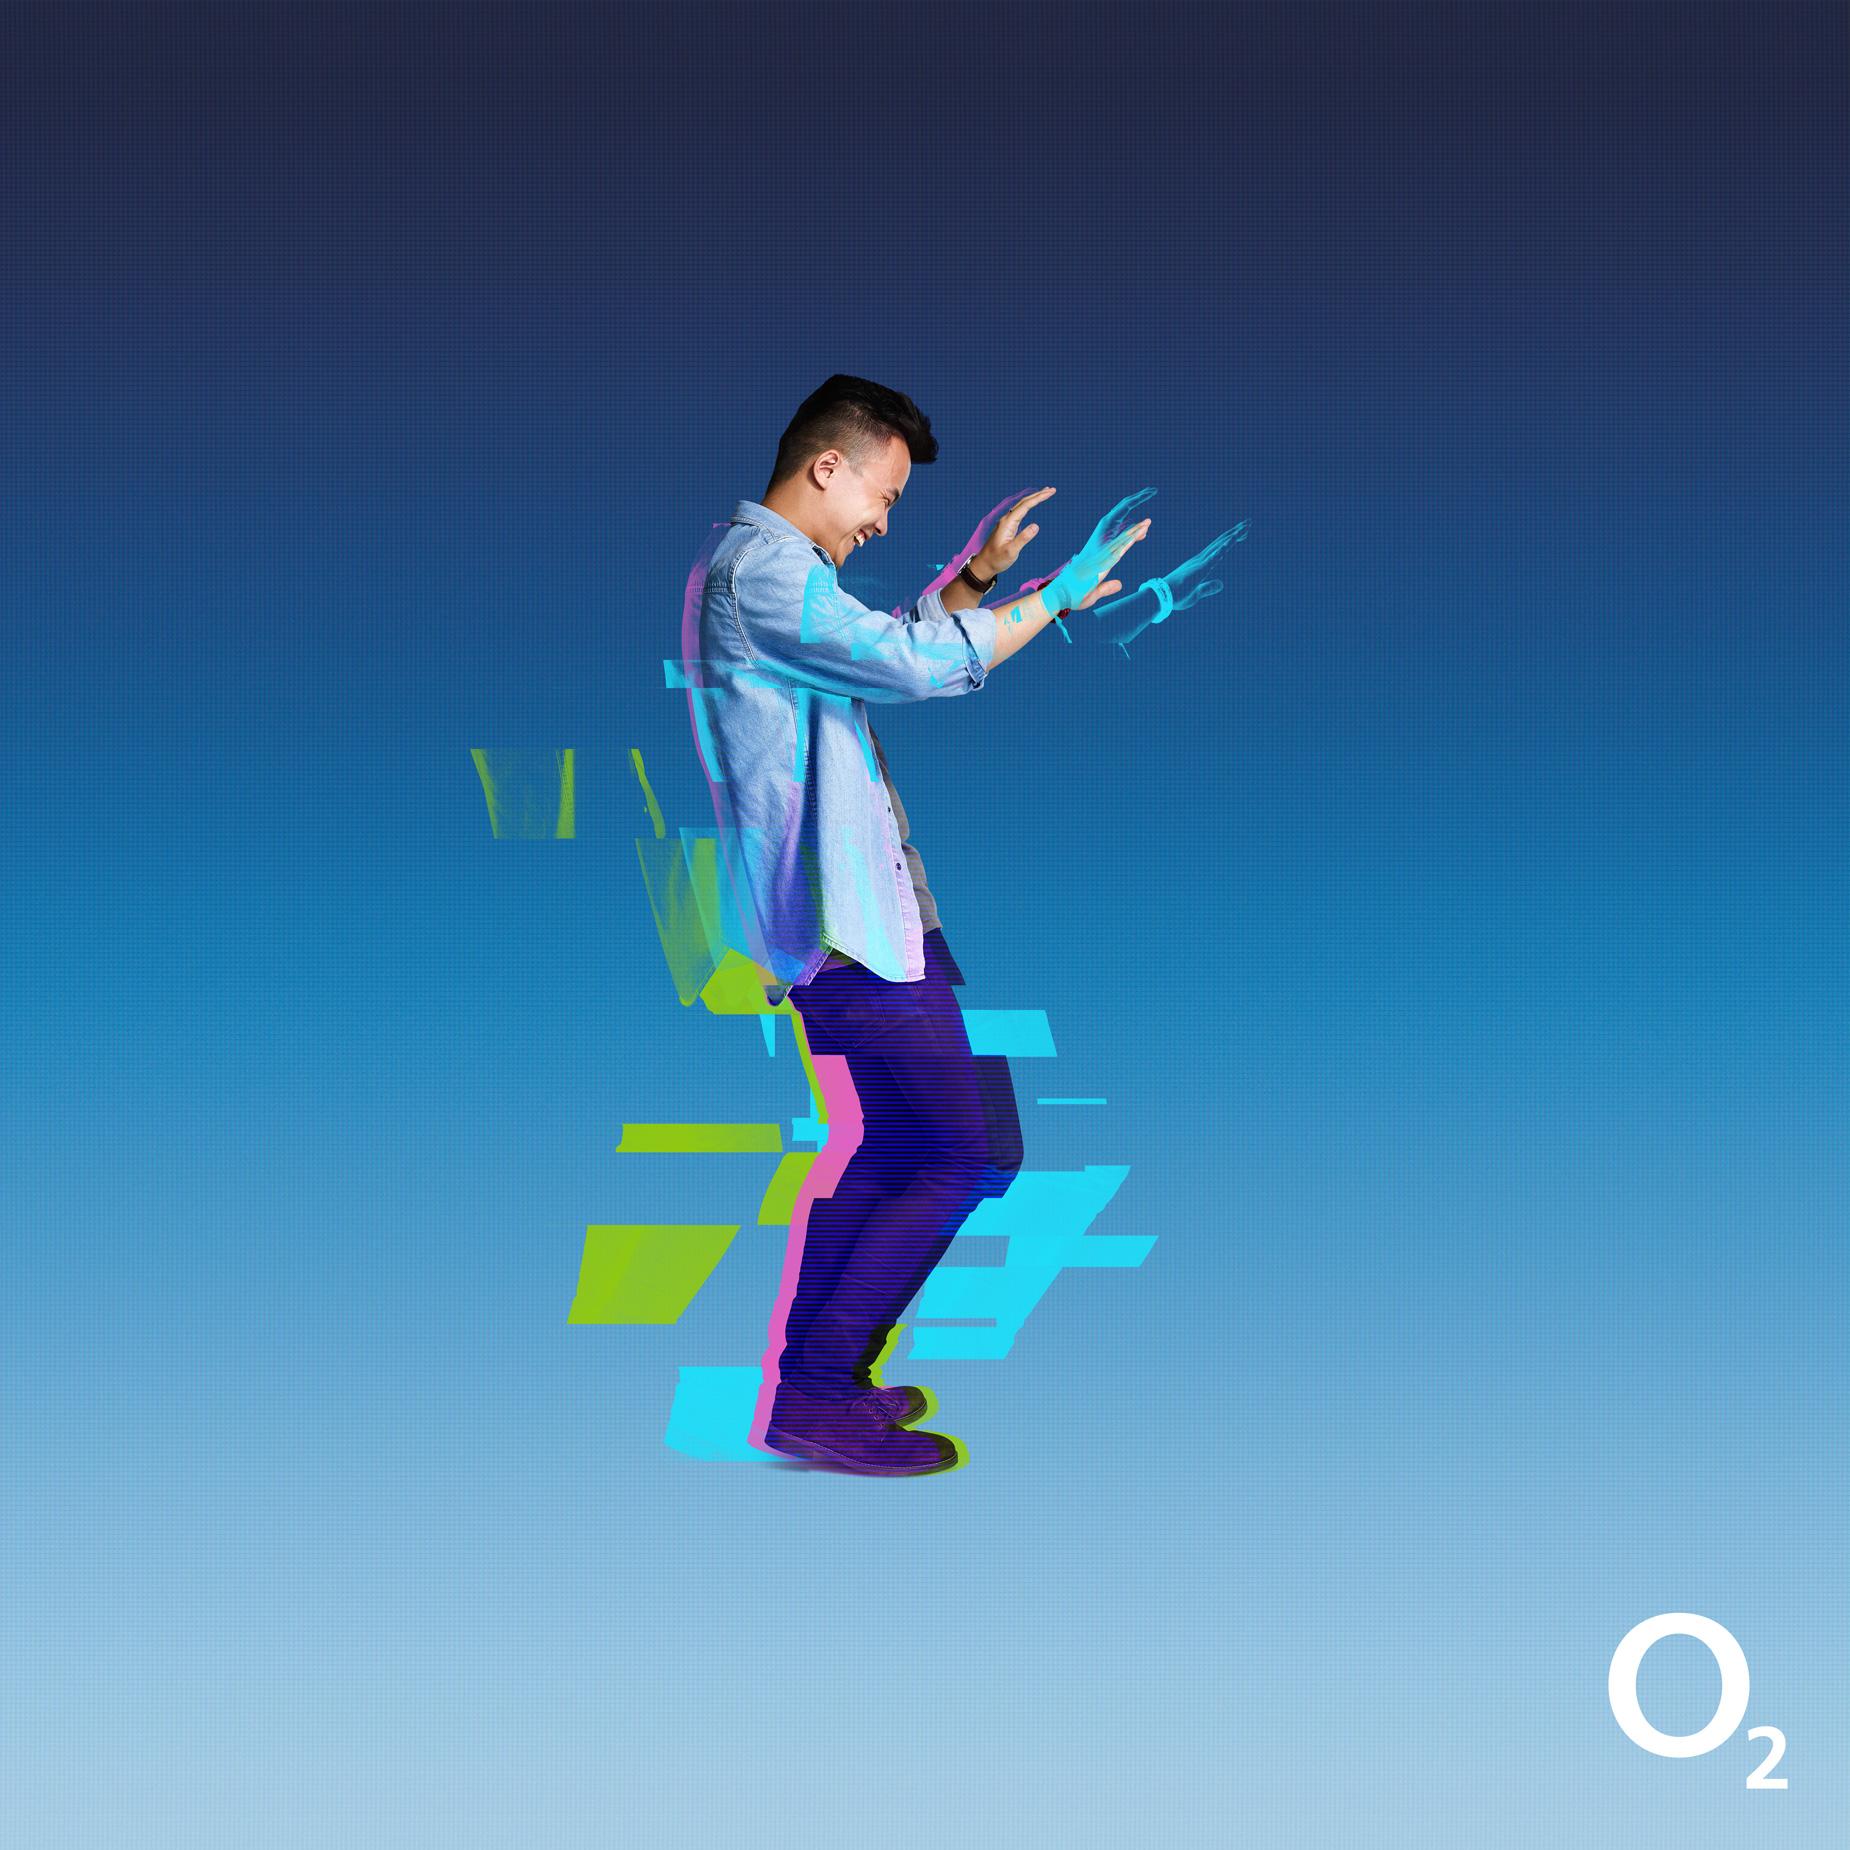 O2-Go-Think-Big-Adrian-Pang-3-Small-RGB